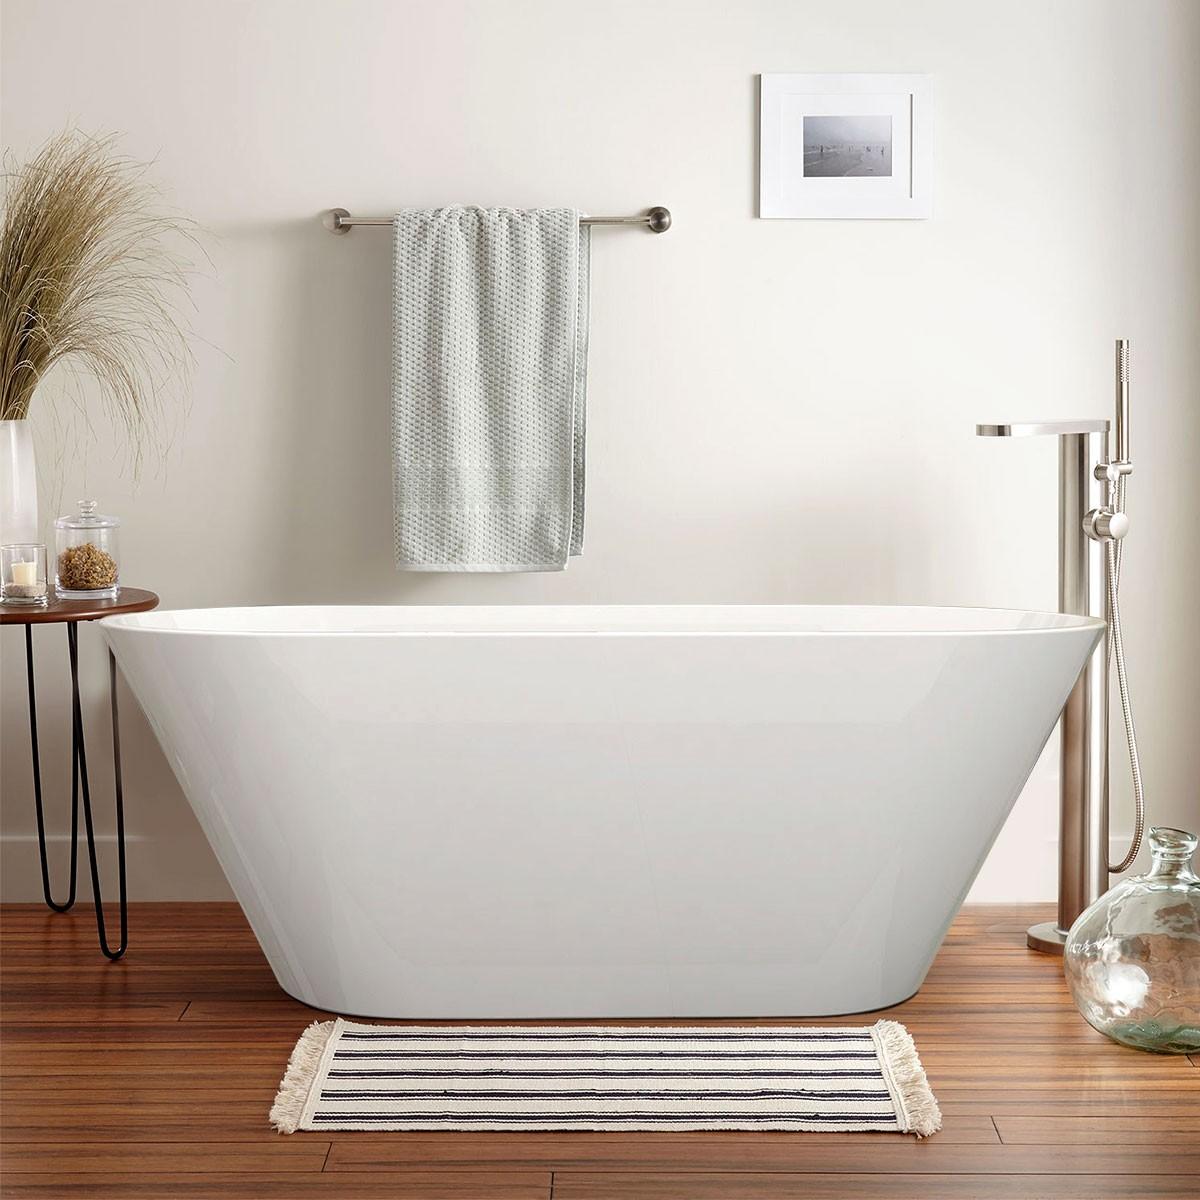 70 In Freestanding Bathtub - Acrylic Pure White (DK-PW-5878)